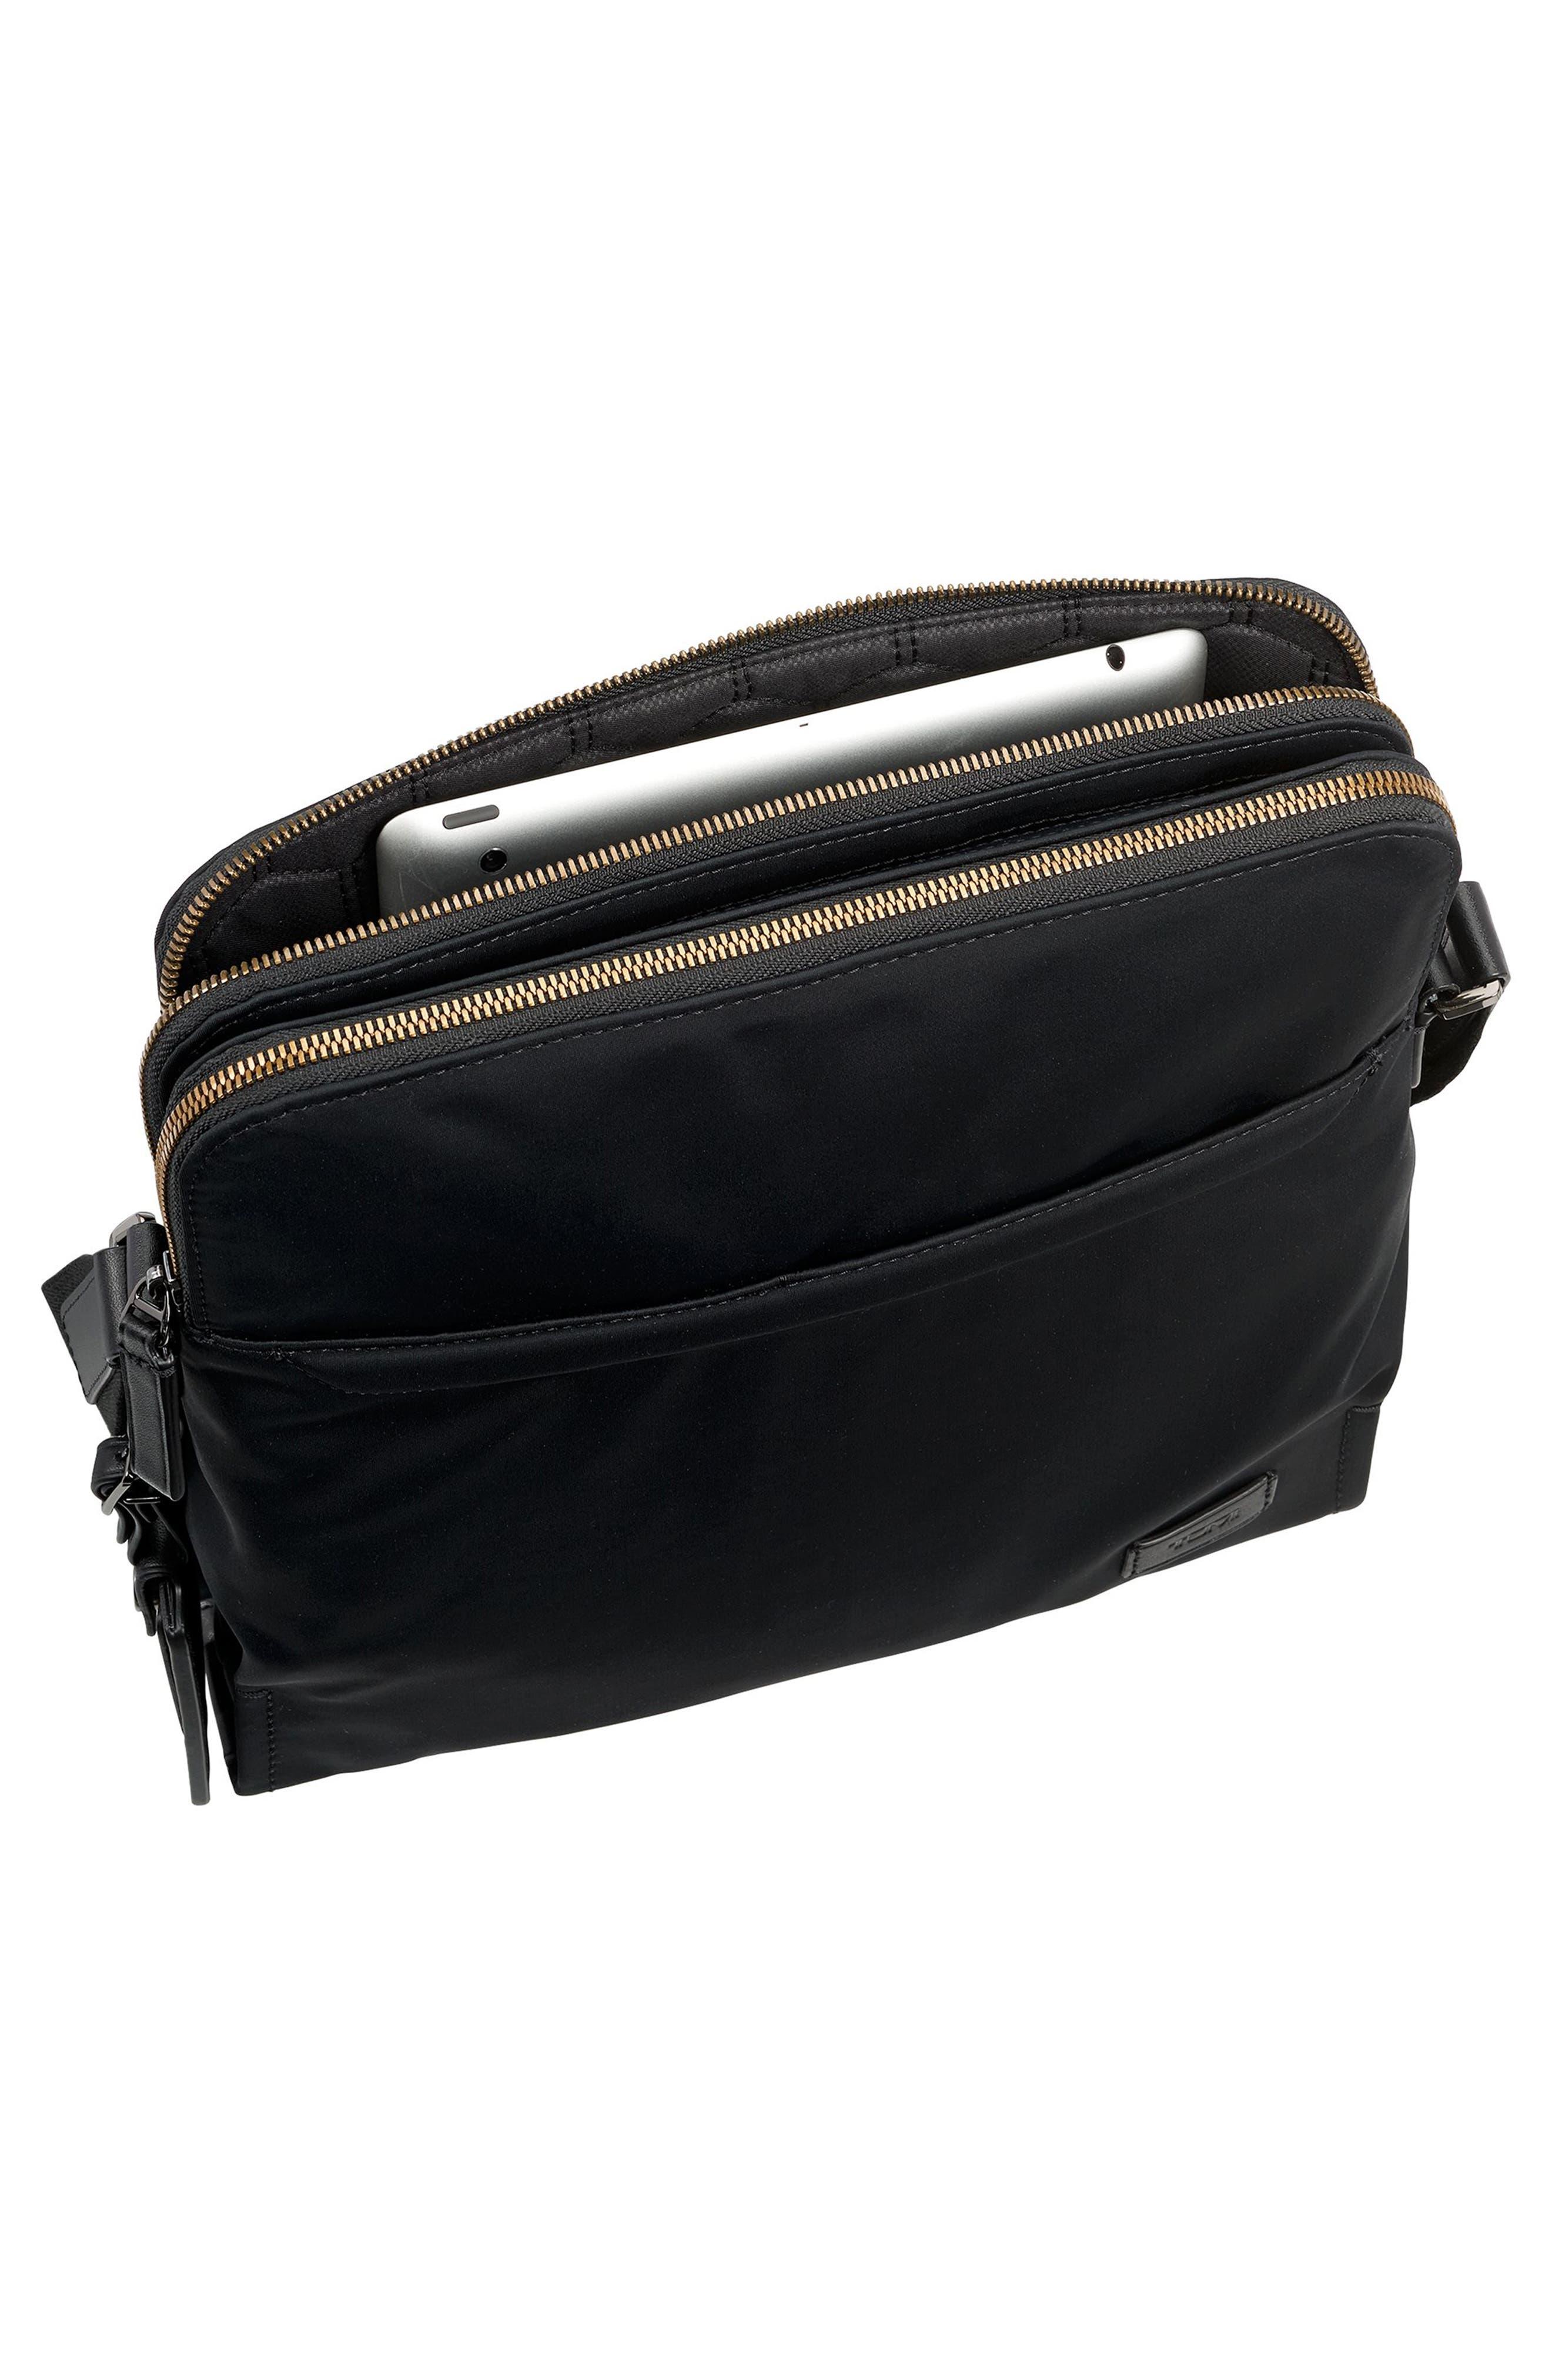 Harrison Stratton Messenger Bag,                             Alternate thumbnail 4, color,                             Black Nylon